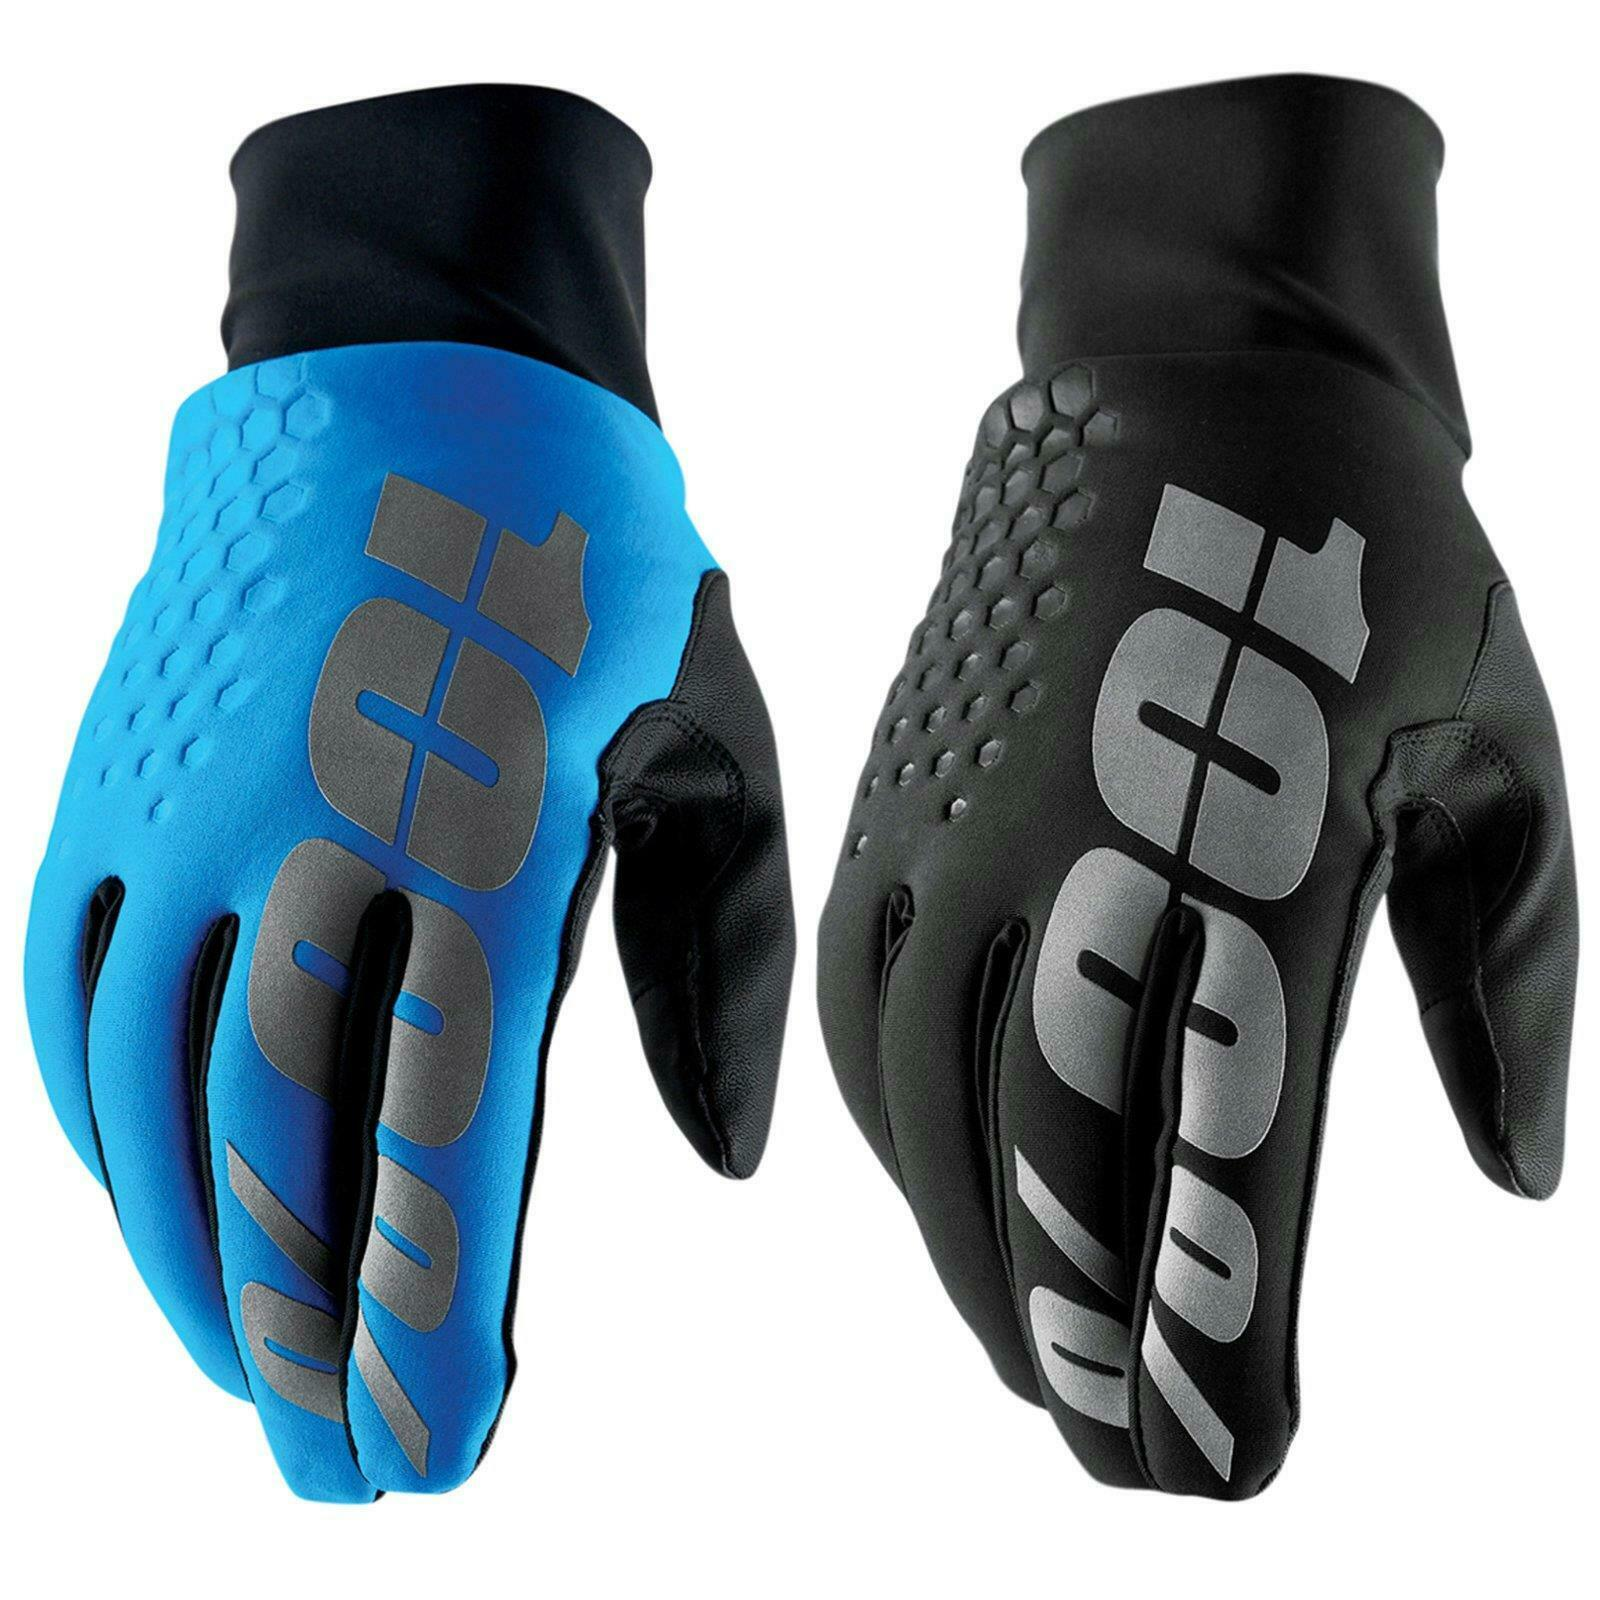 100% Prozent Hydromatic Brisker Handschuhe MTB Wasserdicht Mountain Bike DH FR